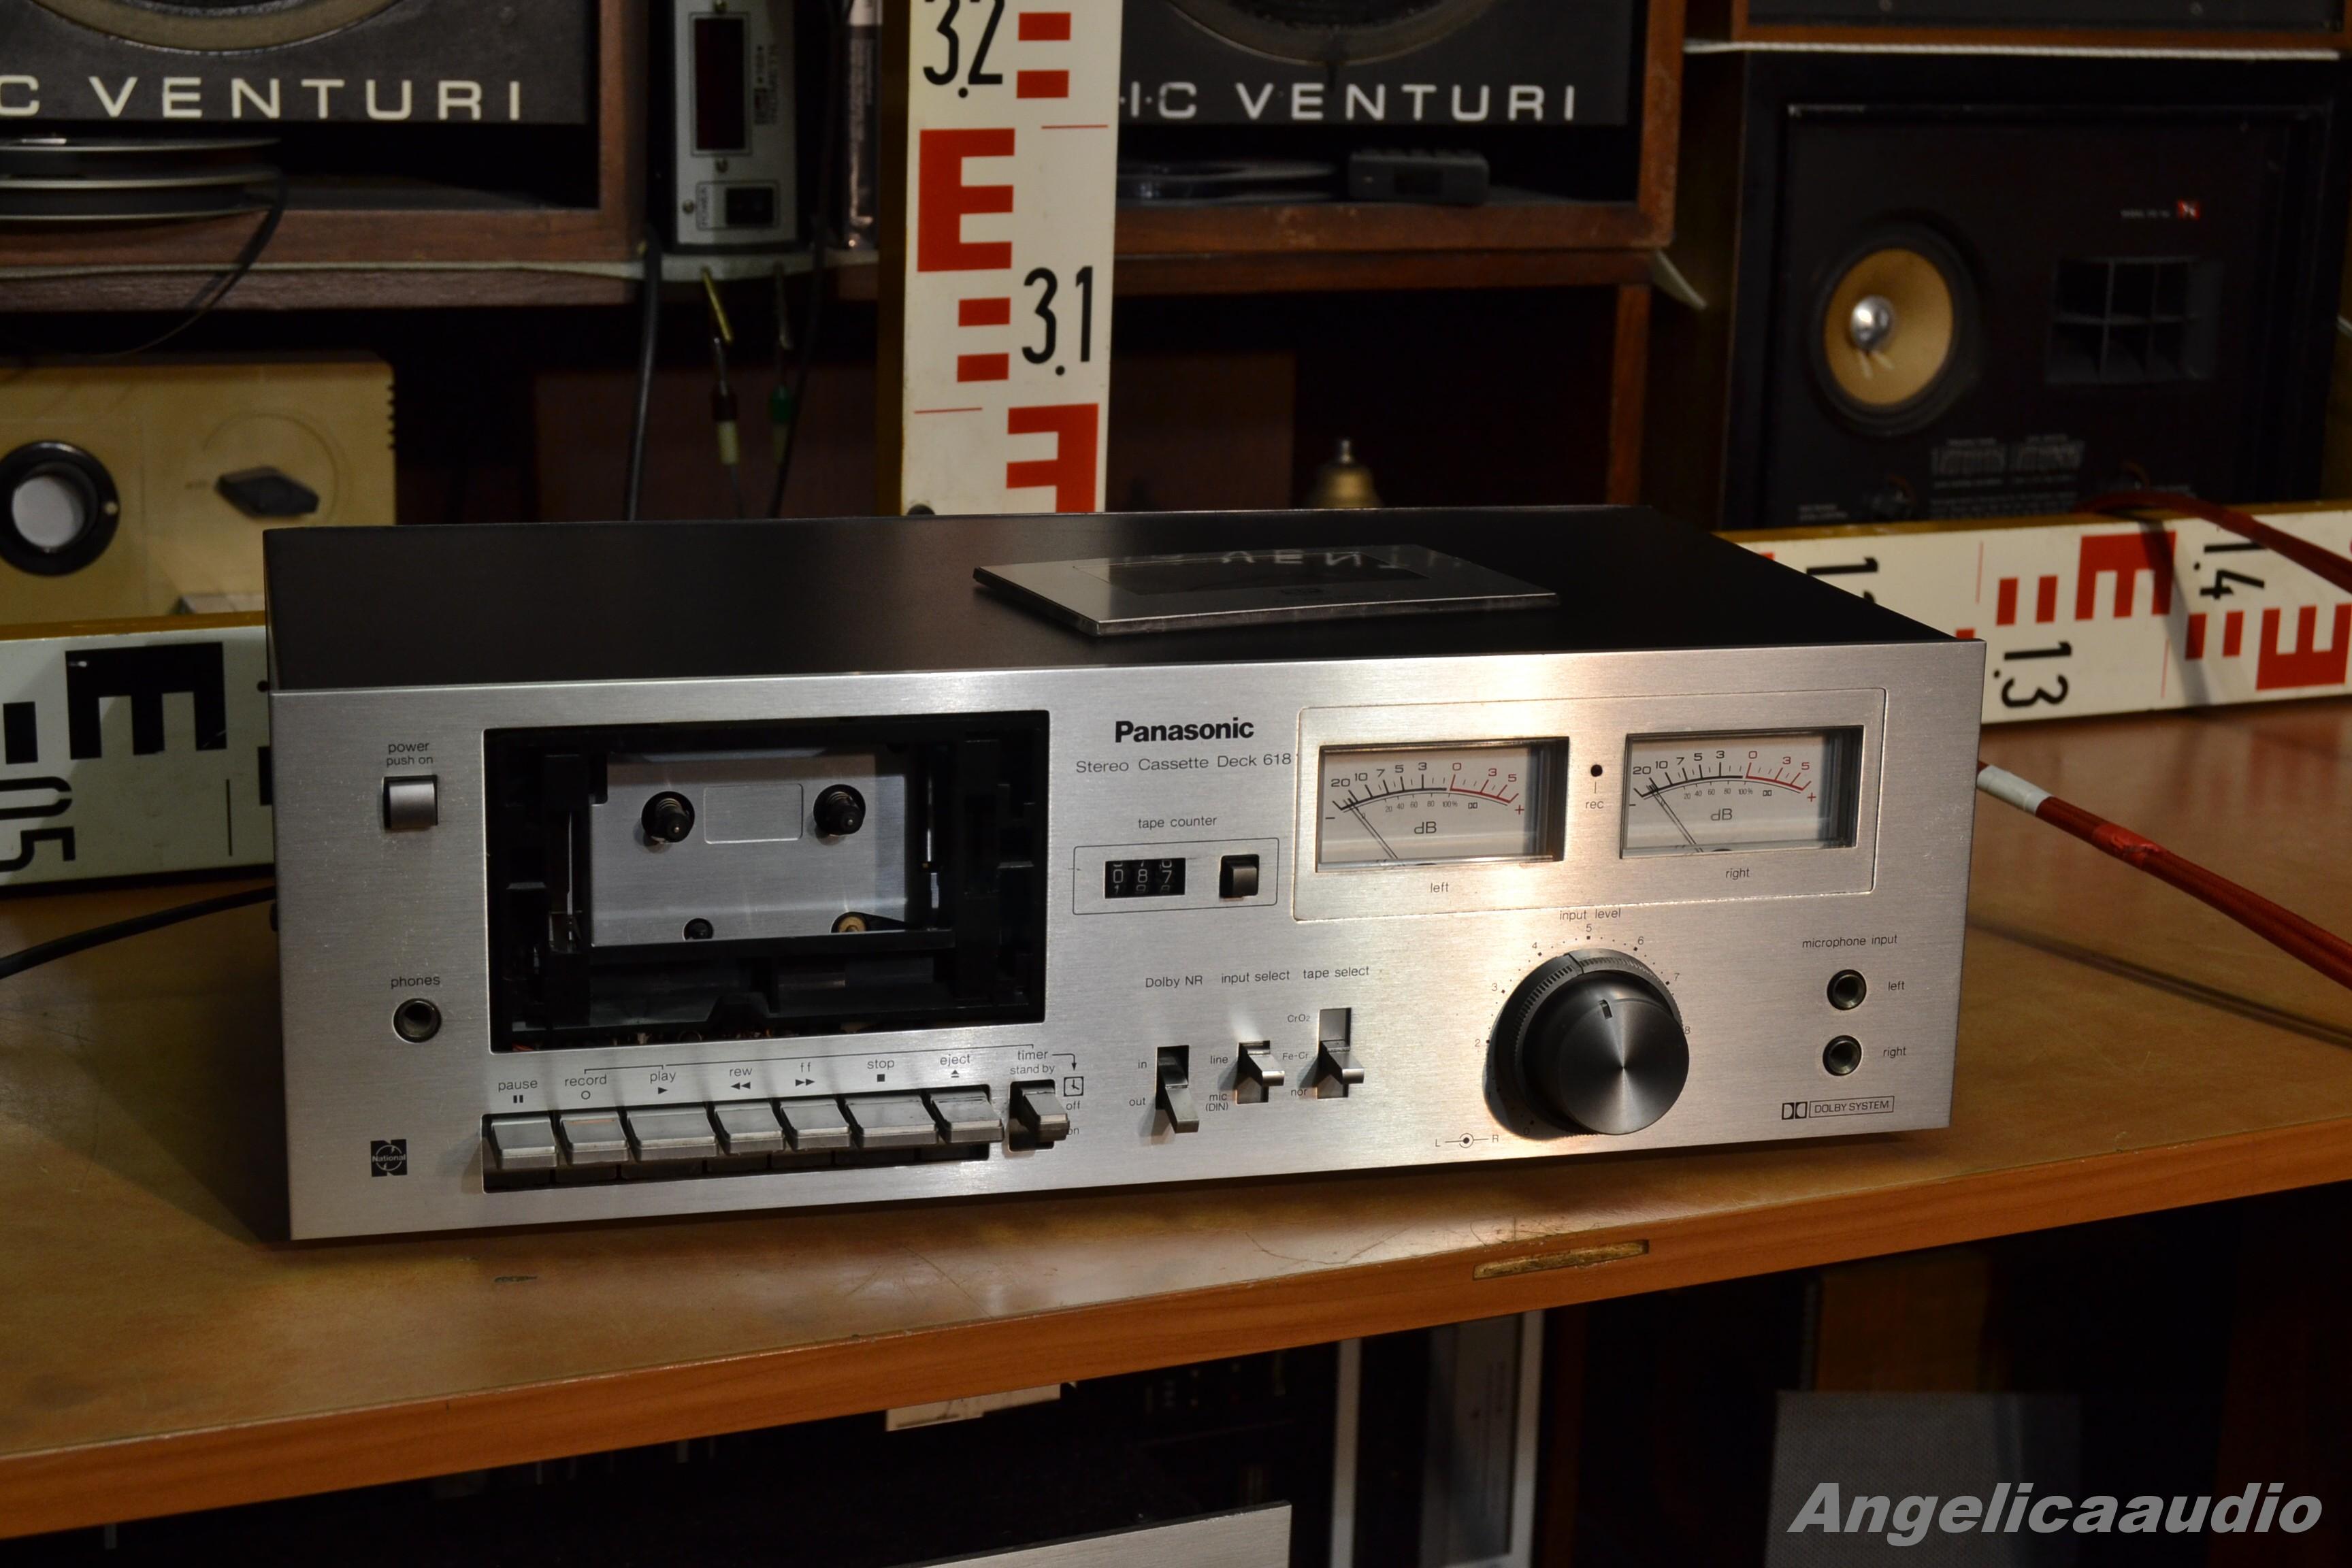 Panasonic Stereo Cassette Deck 618 Made In Japan